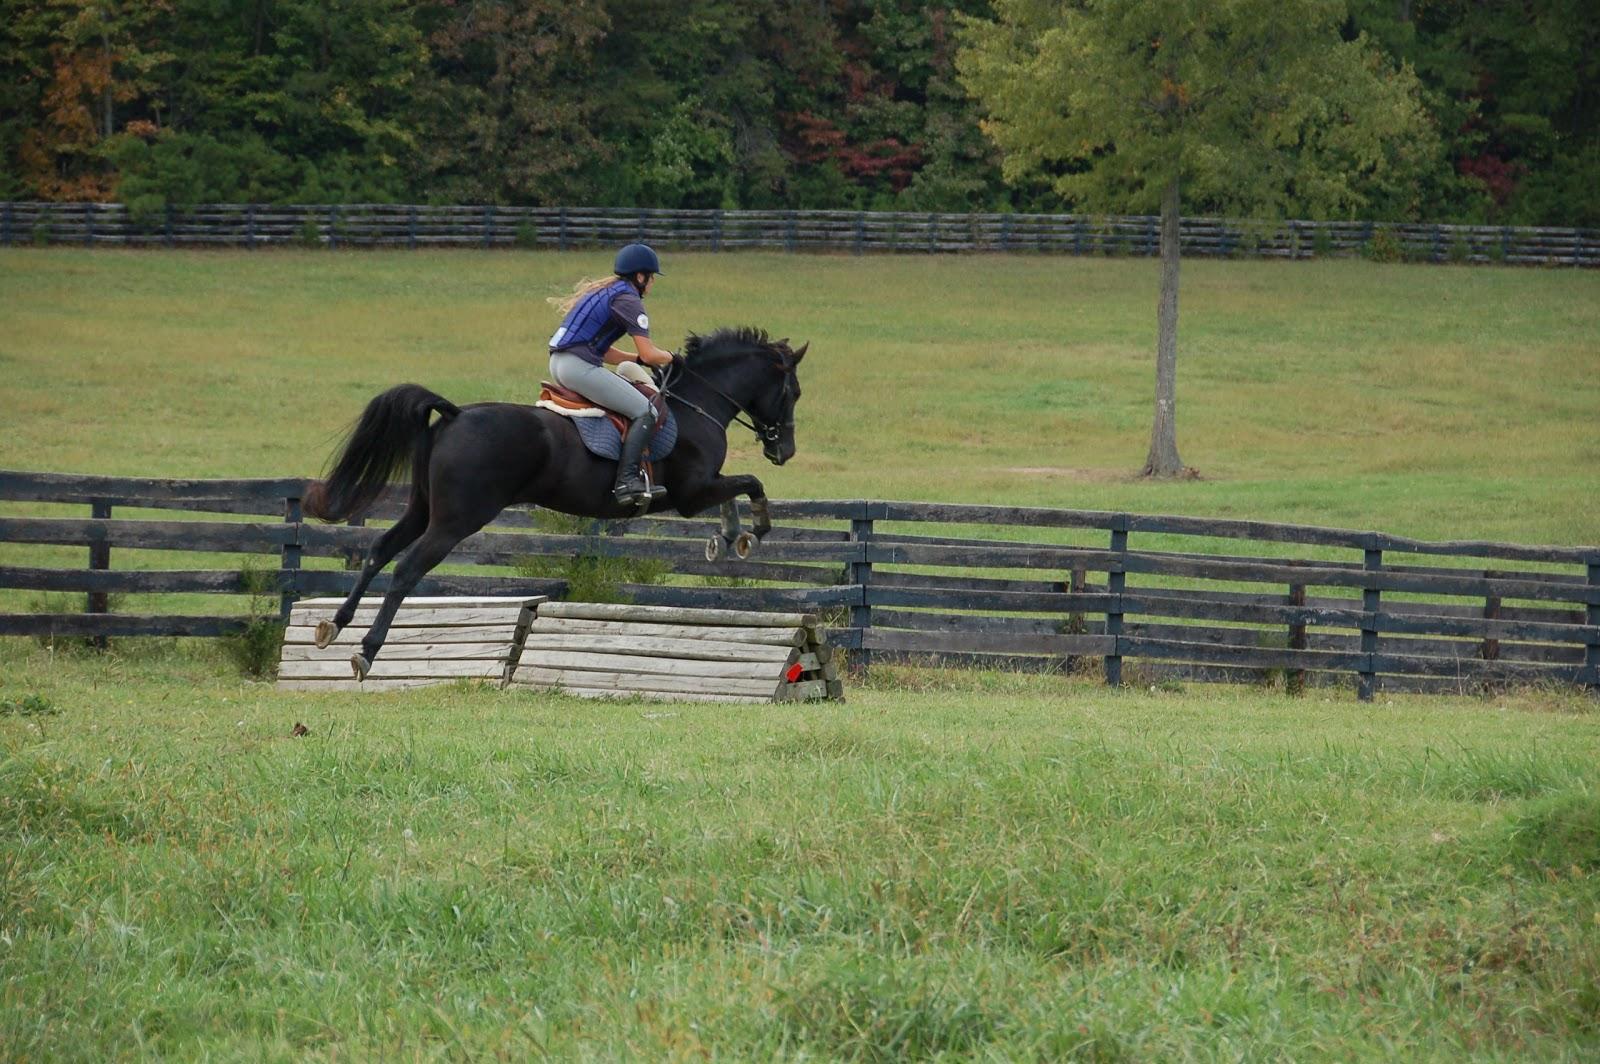 Girl on Beautiful Black Horse Jumping High PictureBlack Horse Jumping